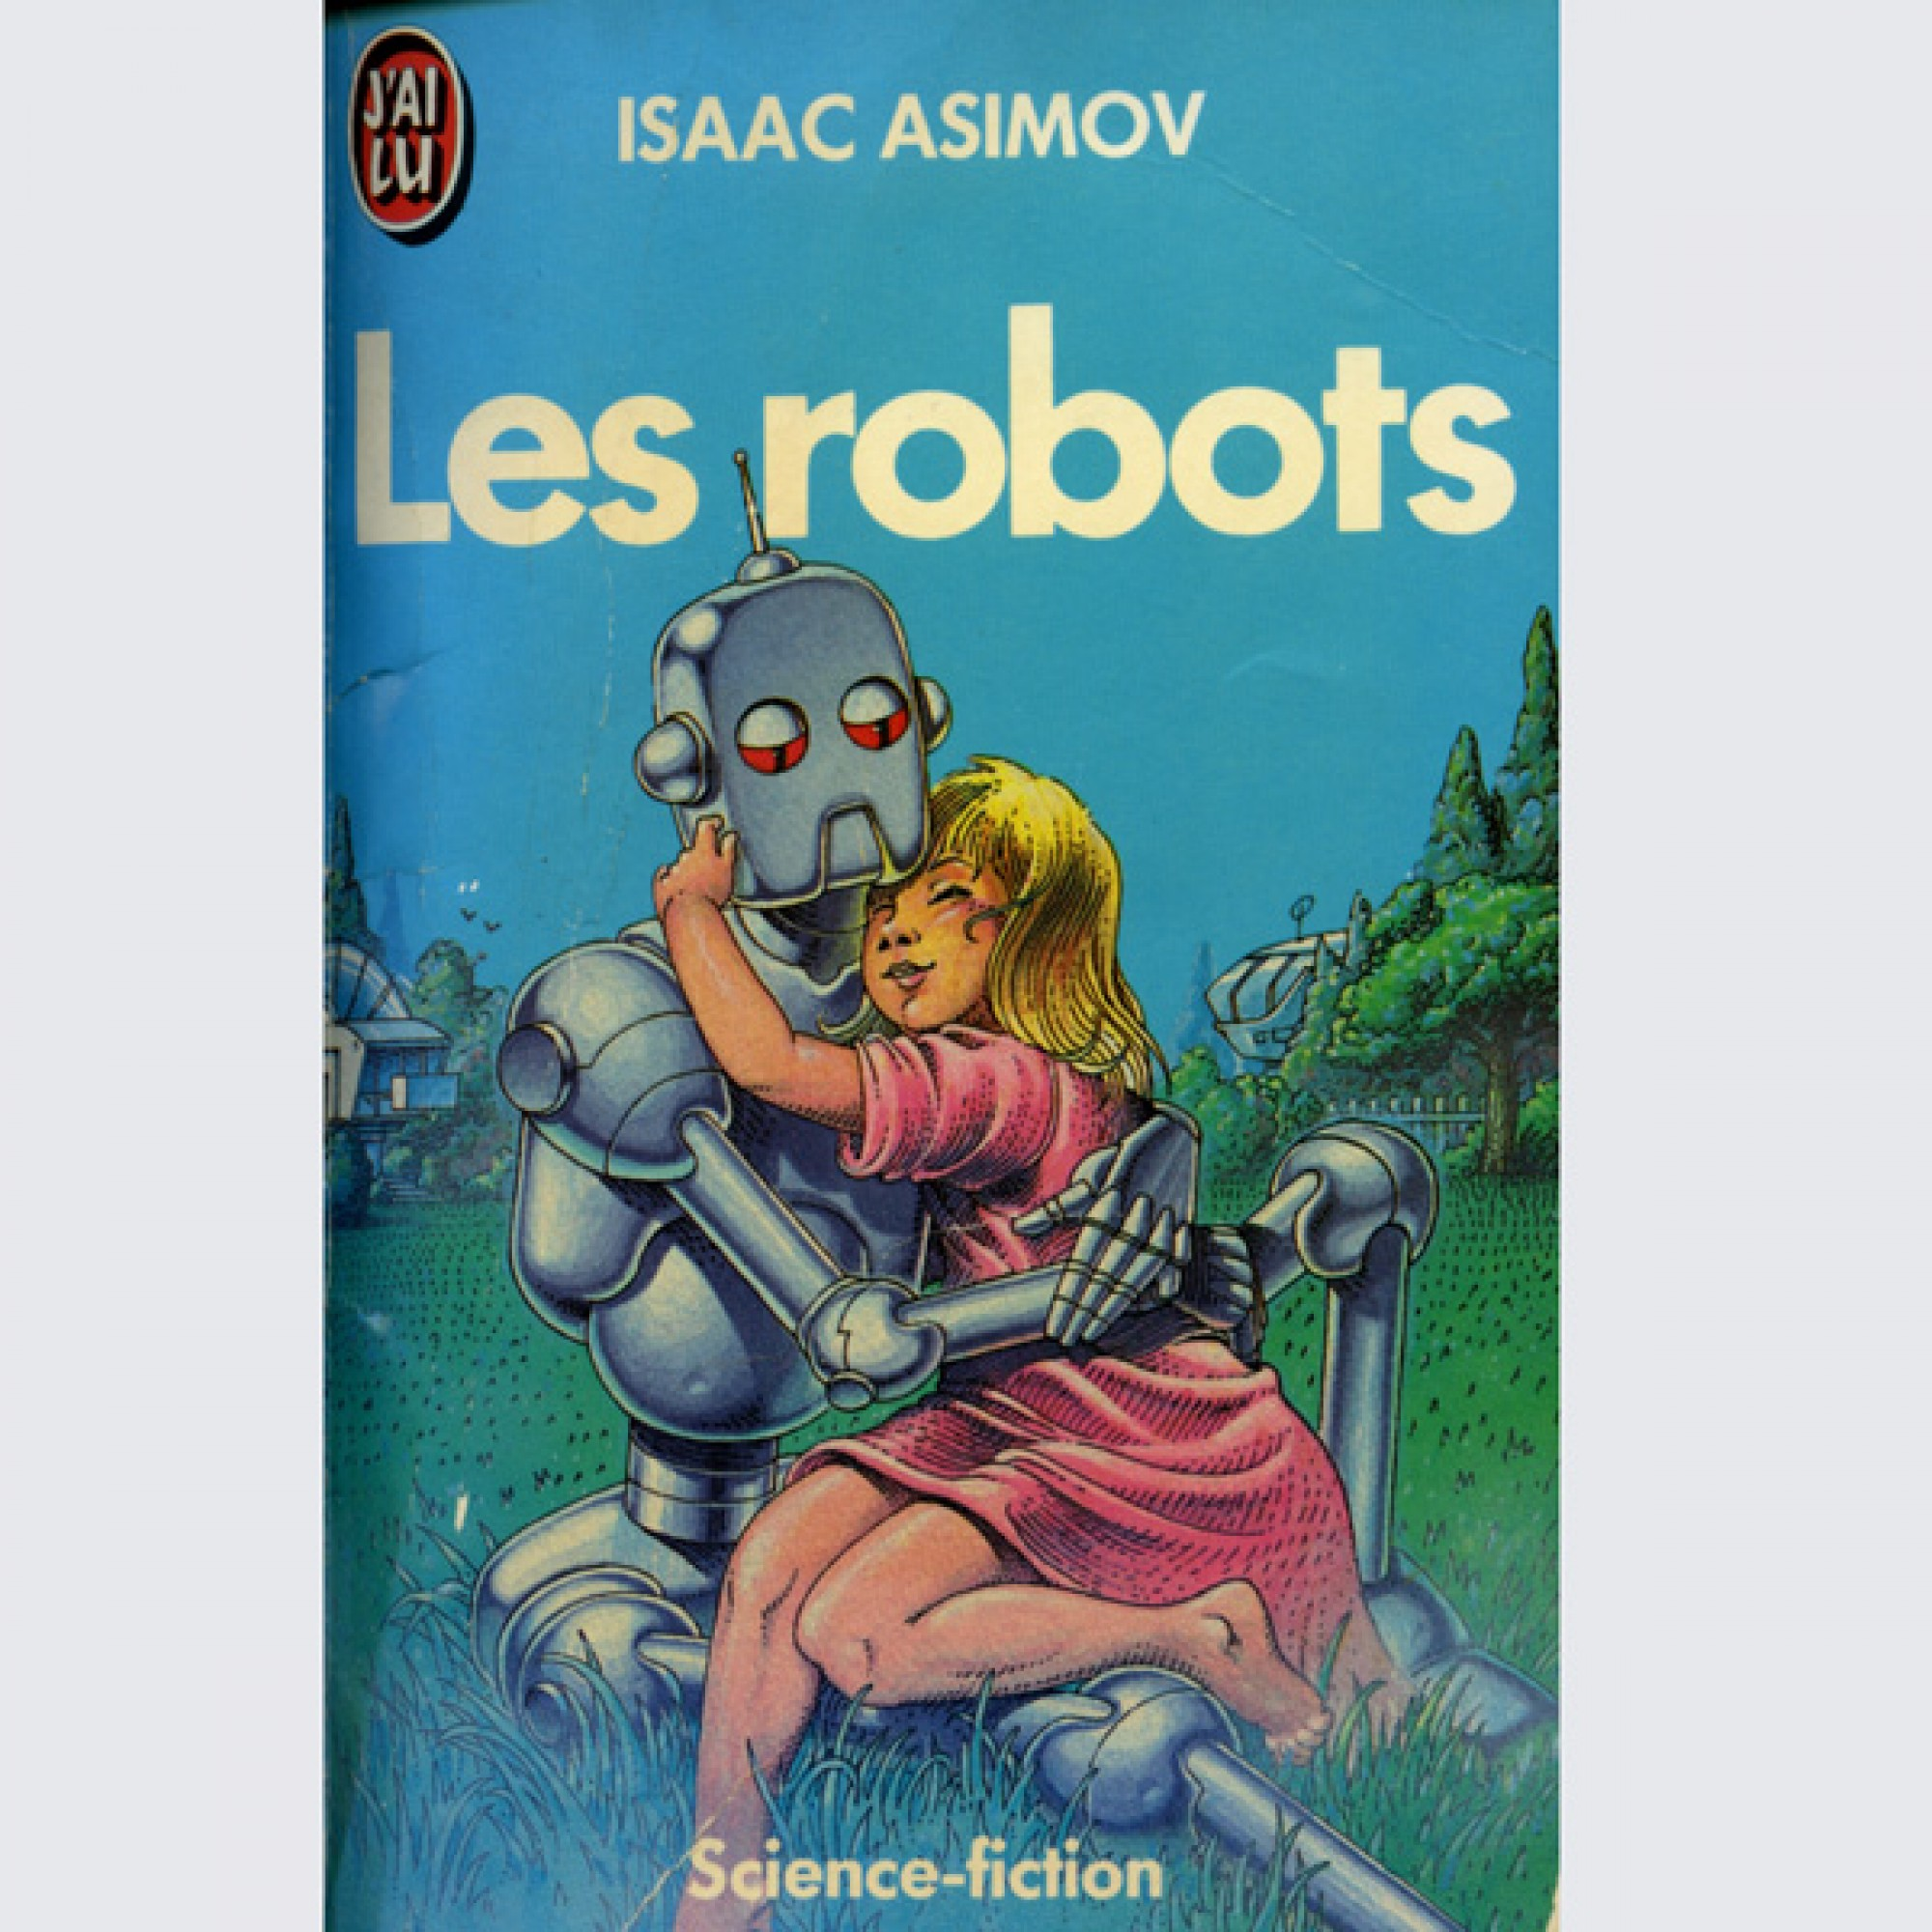 Isaac Asimov : Les Robots, Paris, J'ai Lu, Science-fiction n° 453, 1976